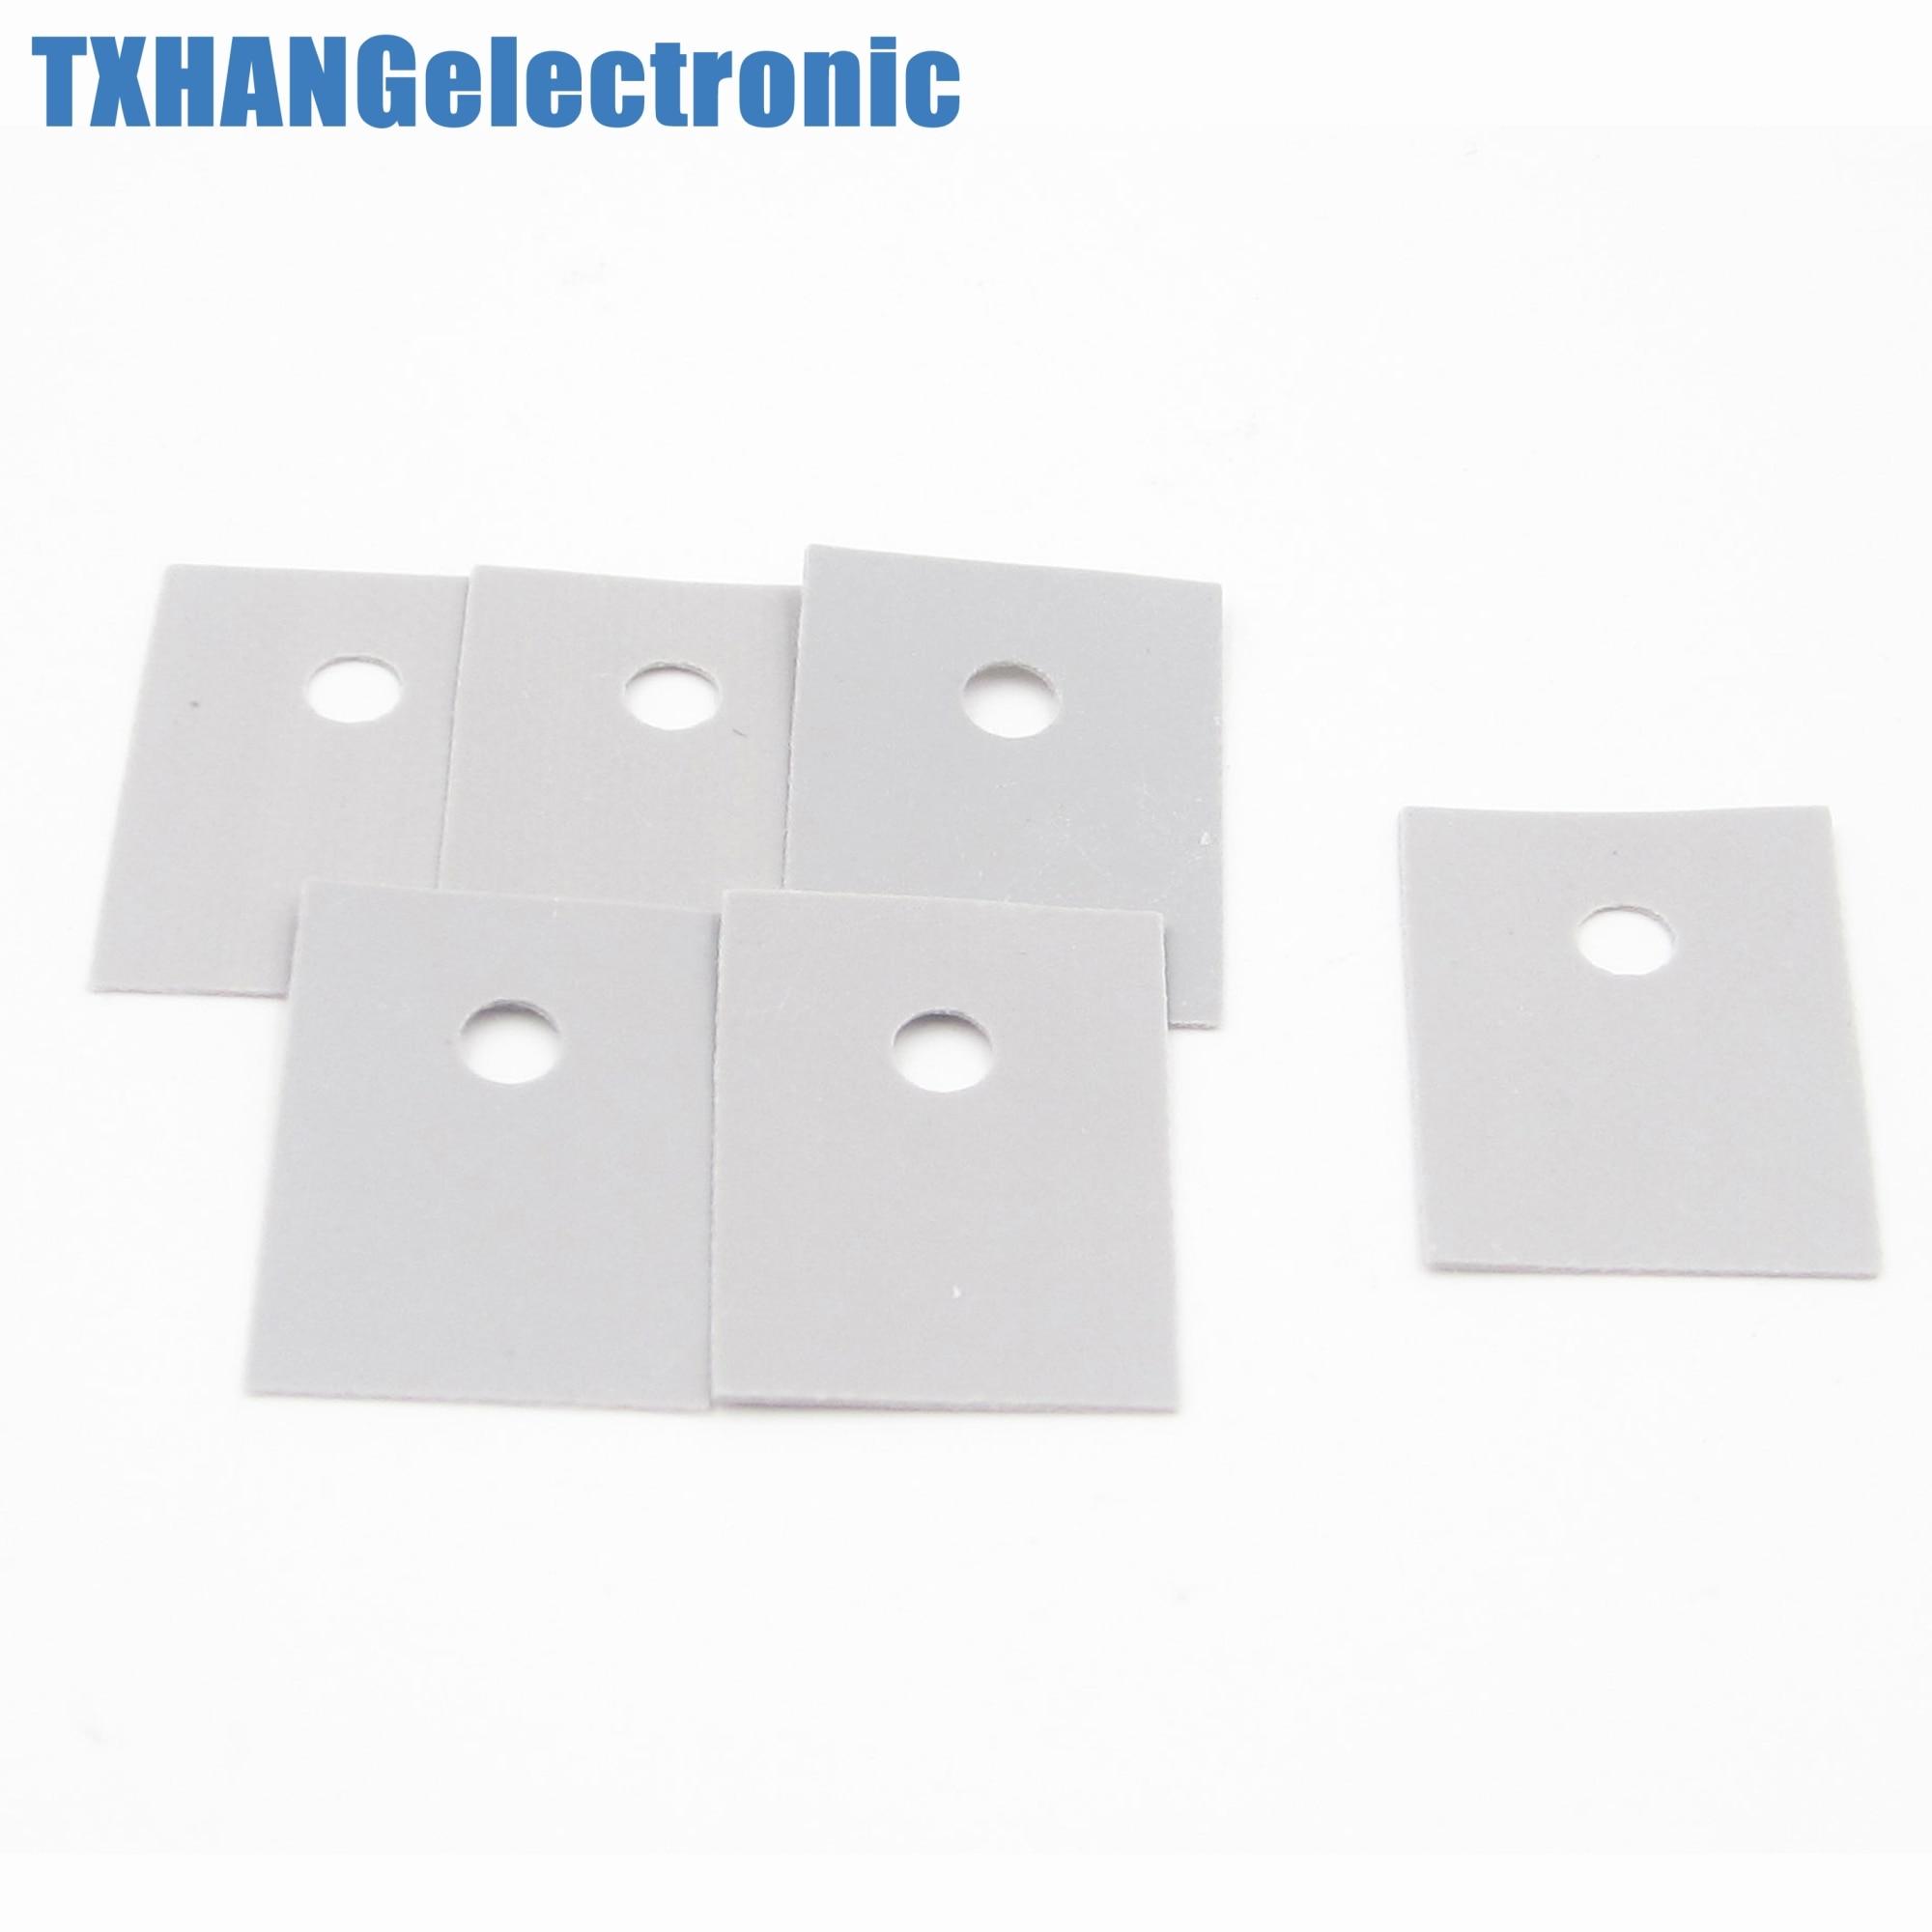 TO-220 Plastic Washer Insulation Transistor Circle//Pad Silicone Heatsink for GPU